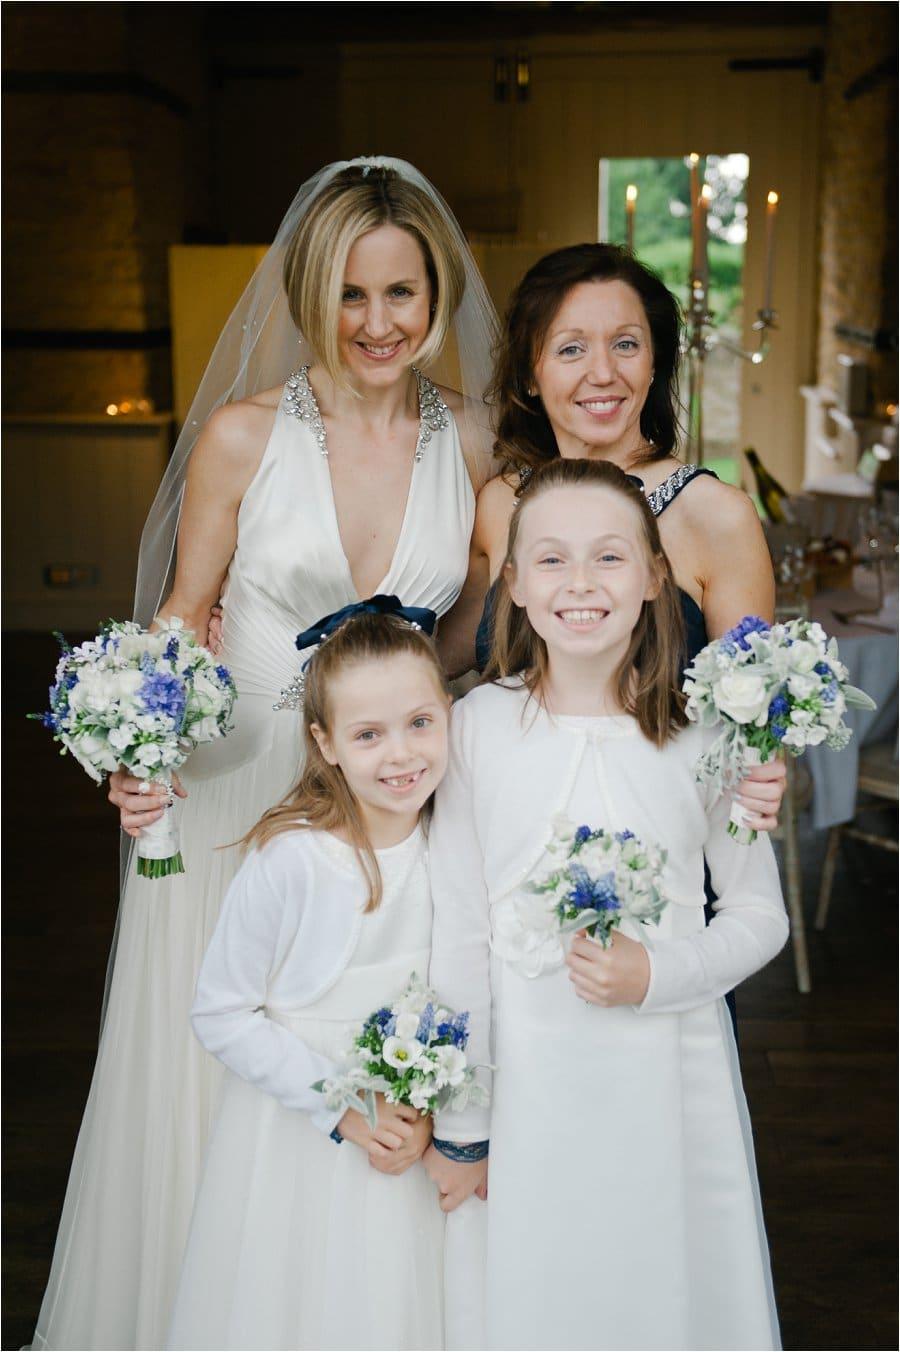 Wick Farm bride with bridesmaids portrait